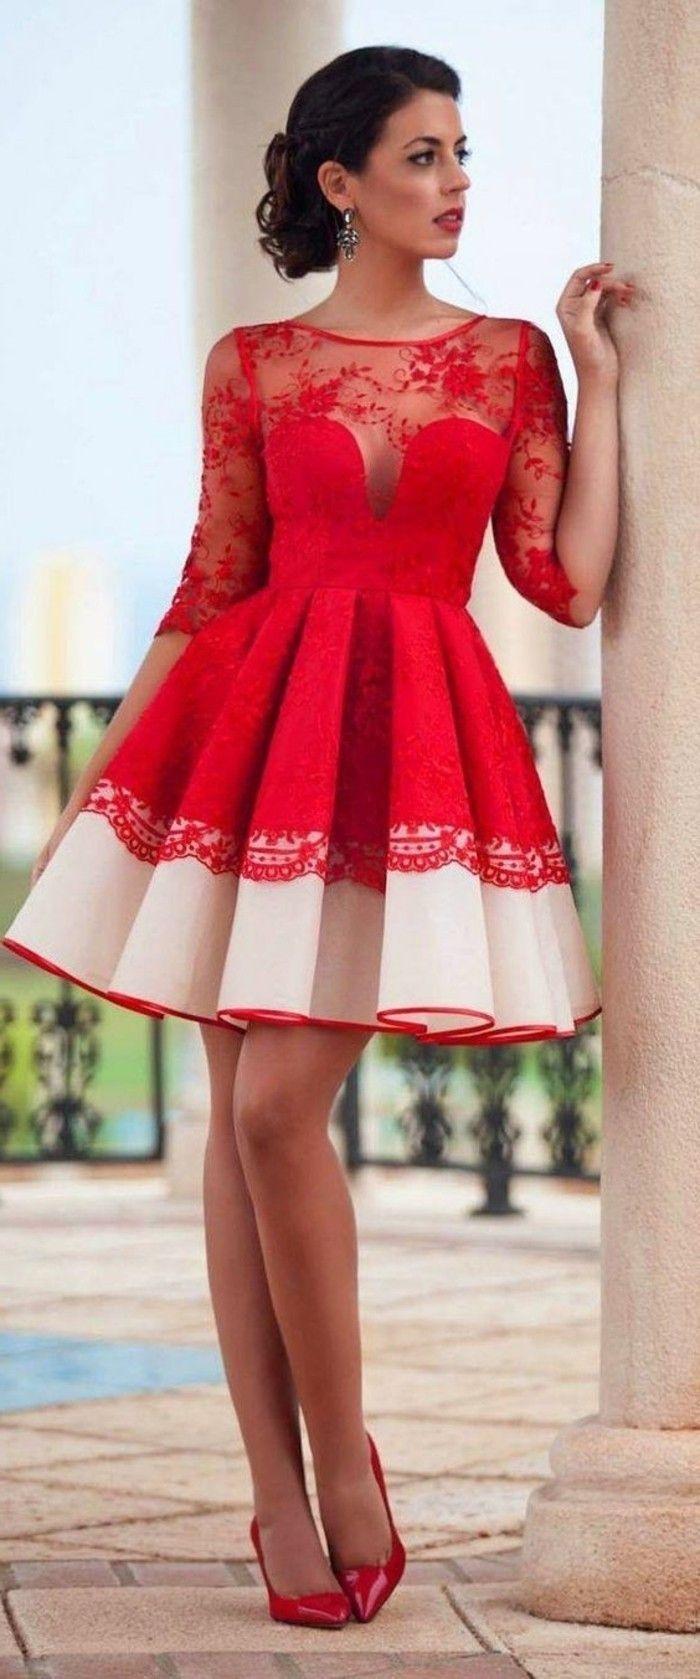 13 Kreativ Rotes Kleid Festlich Bester Preis17 Luxus Rotes Kleid Festlich Bester Preis